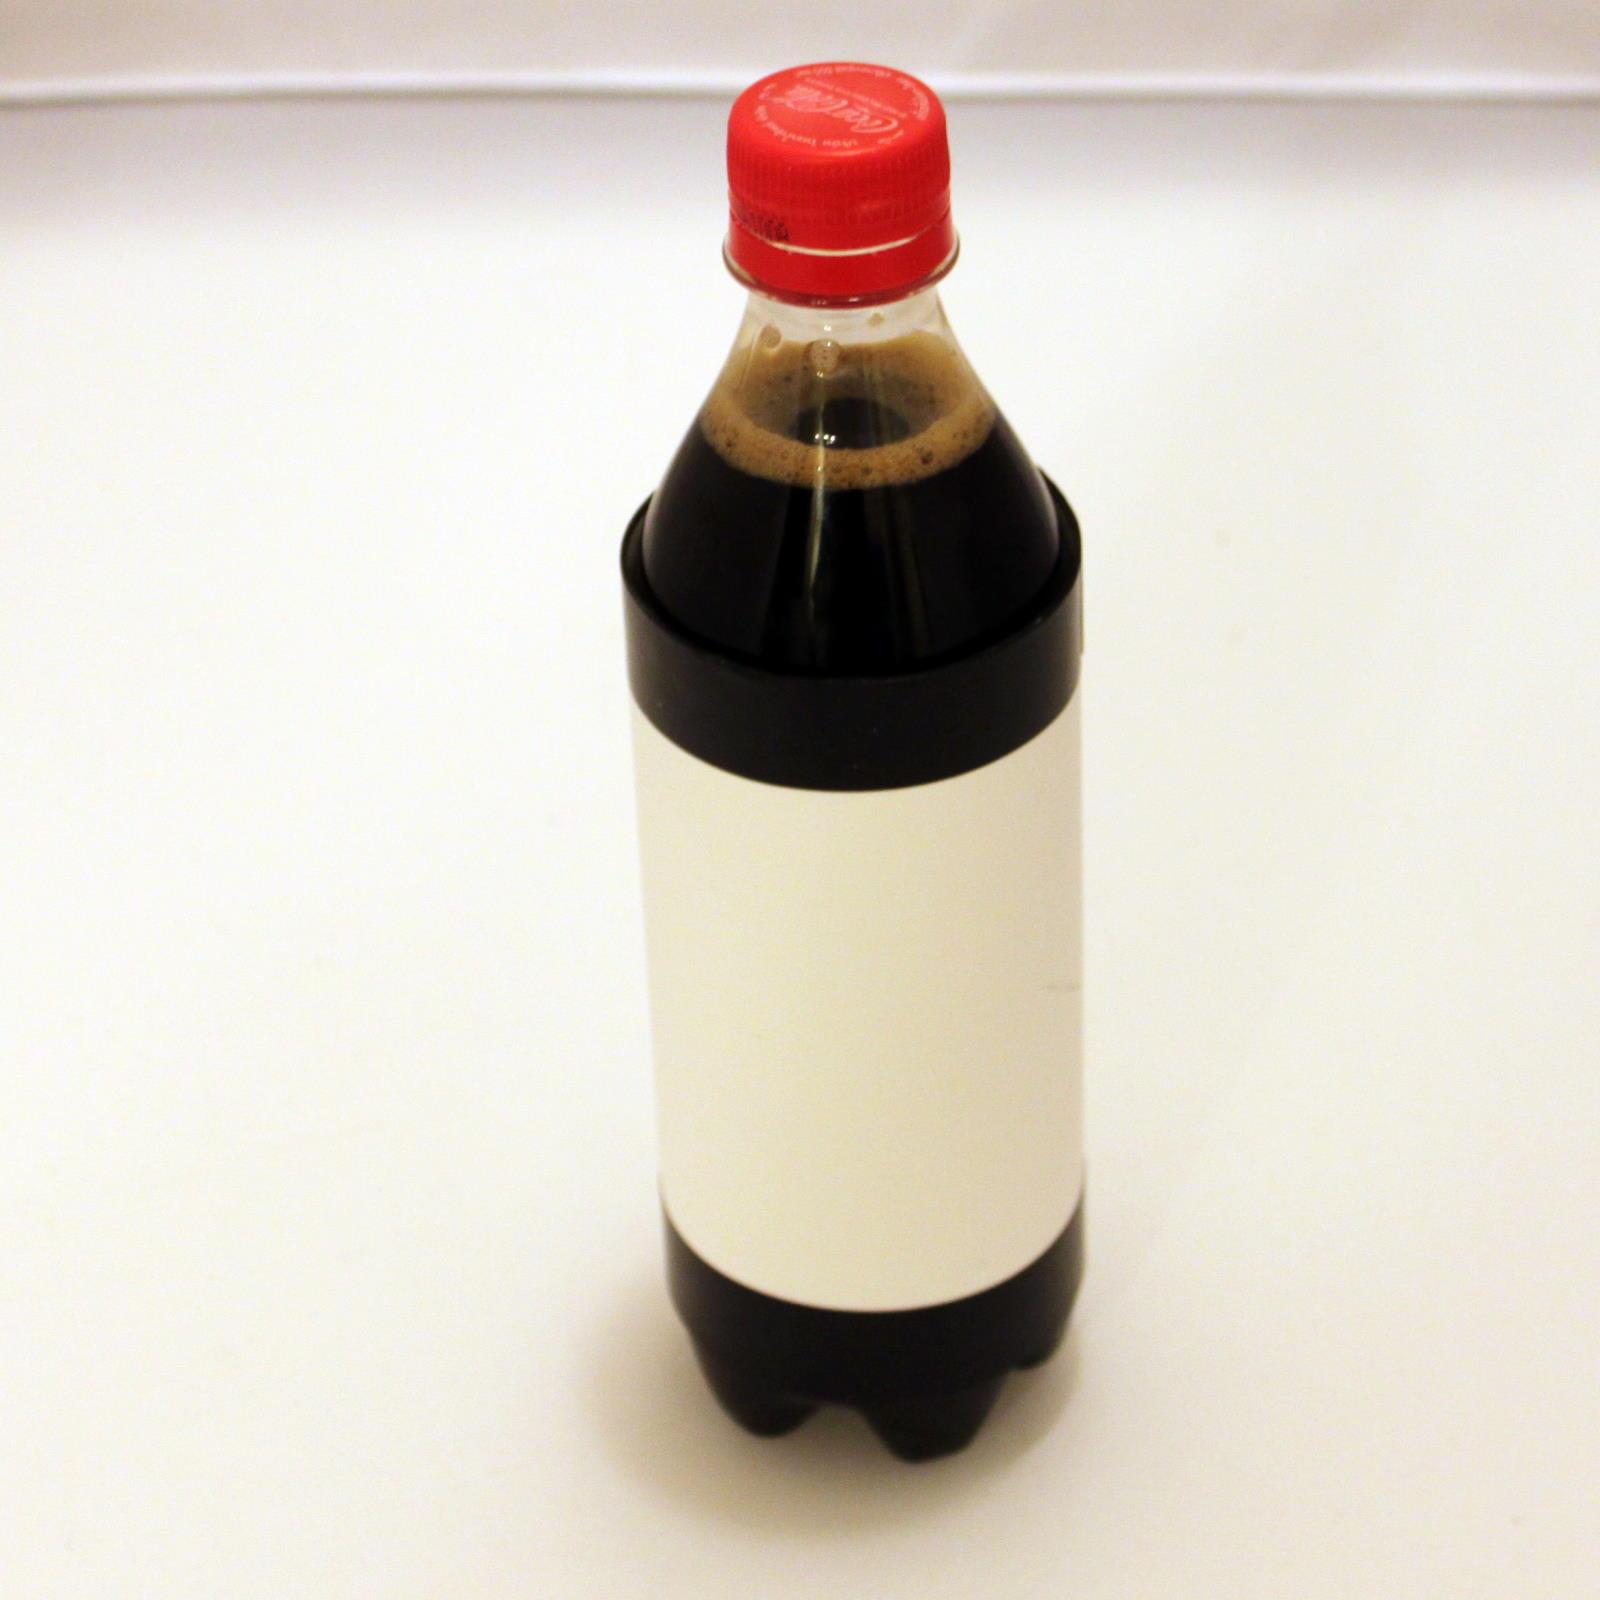 New Vanishing Coca-Cola Bottle by Maxello Magic